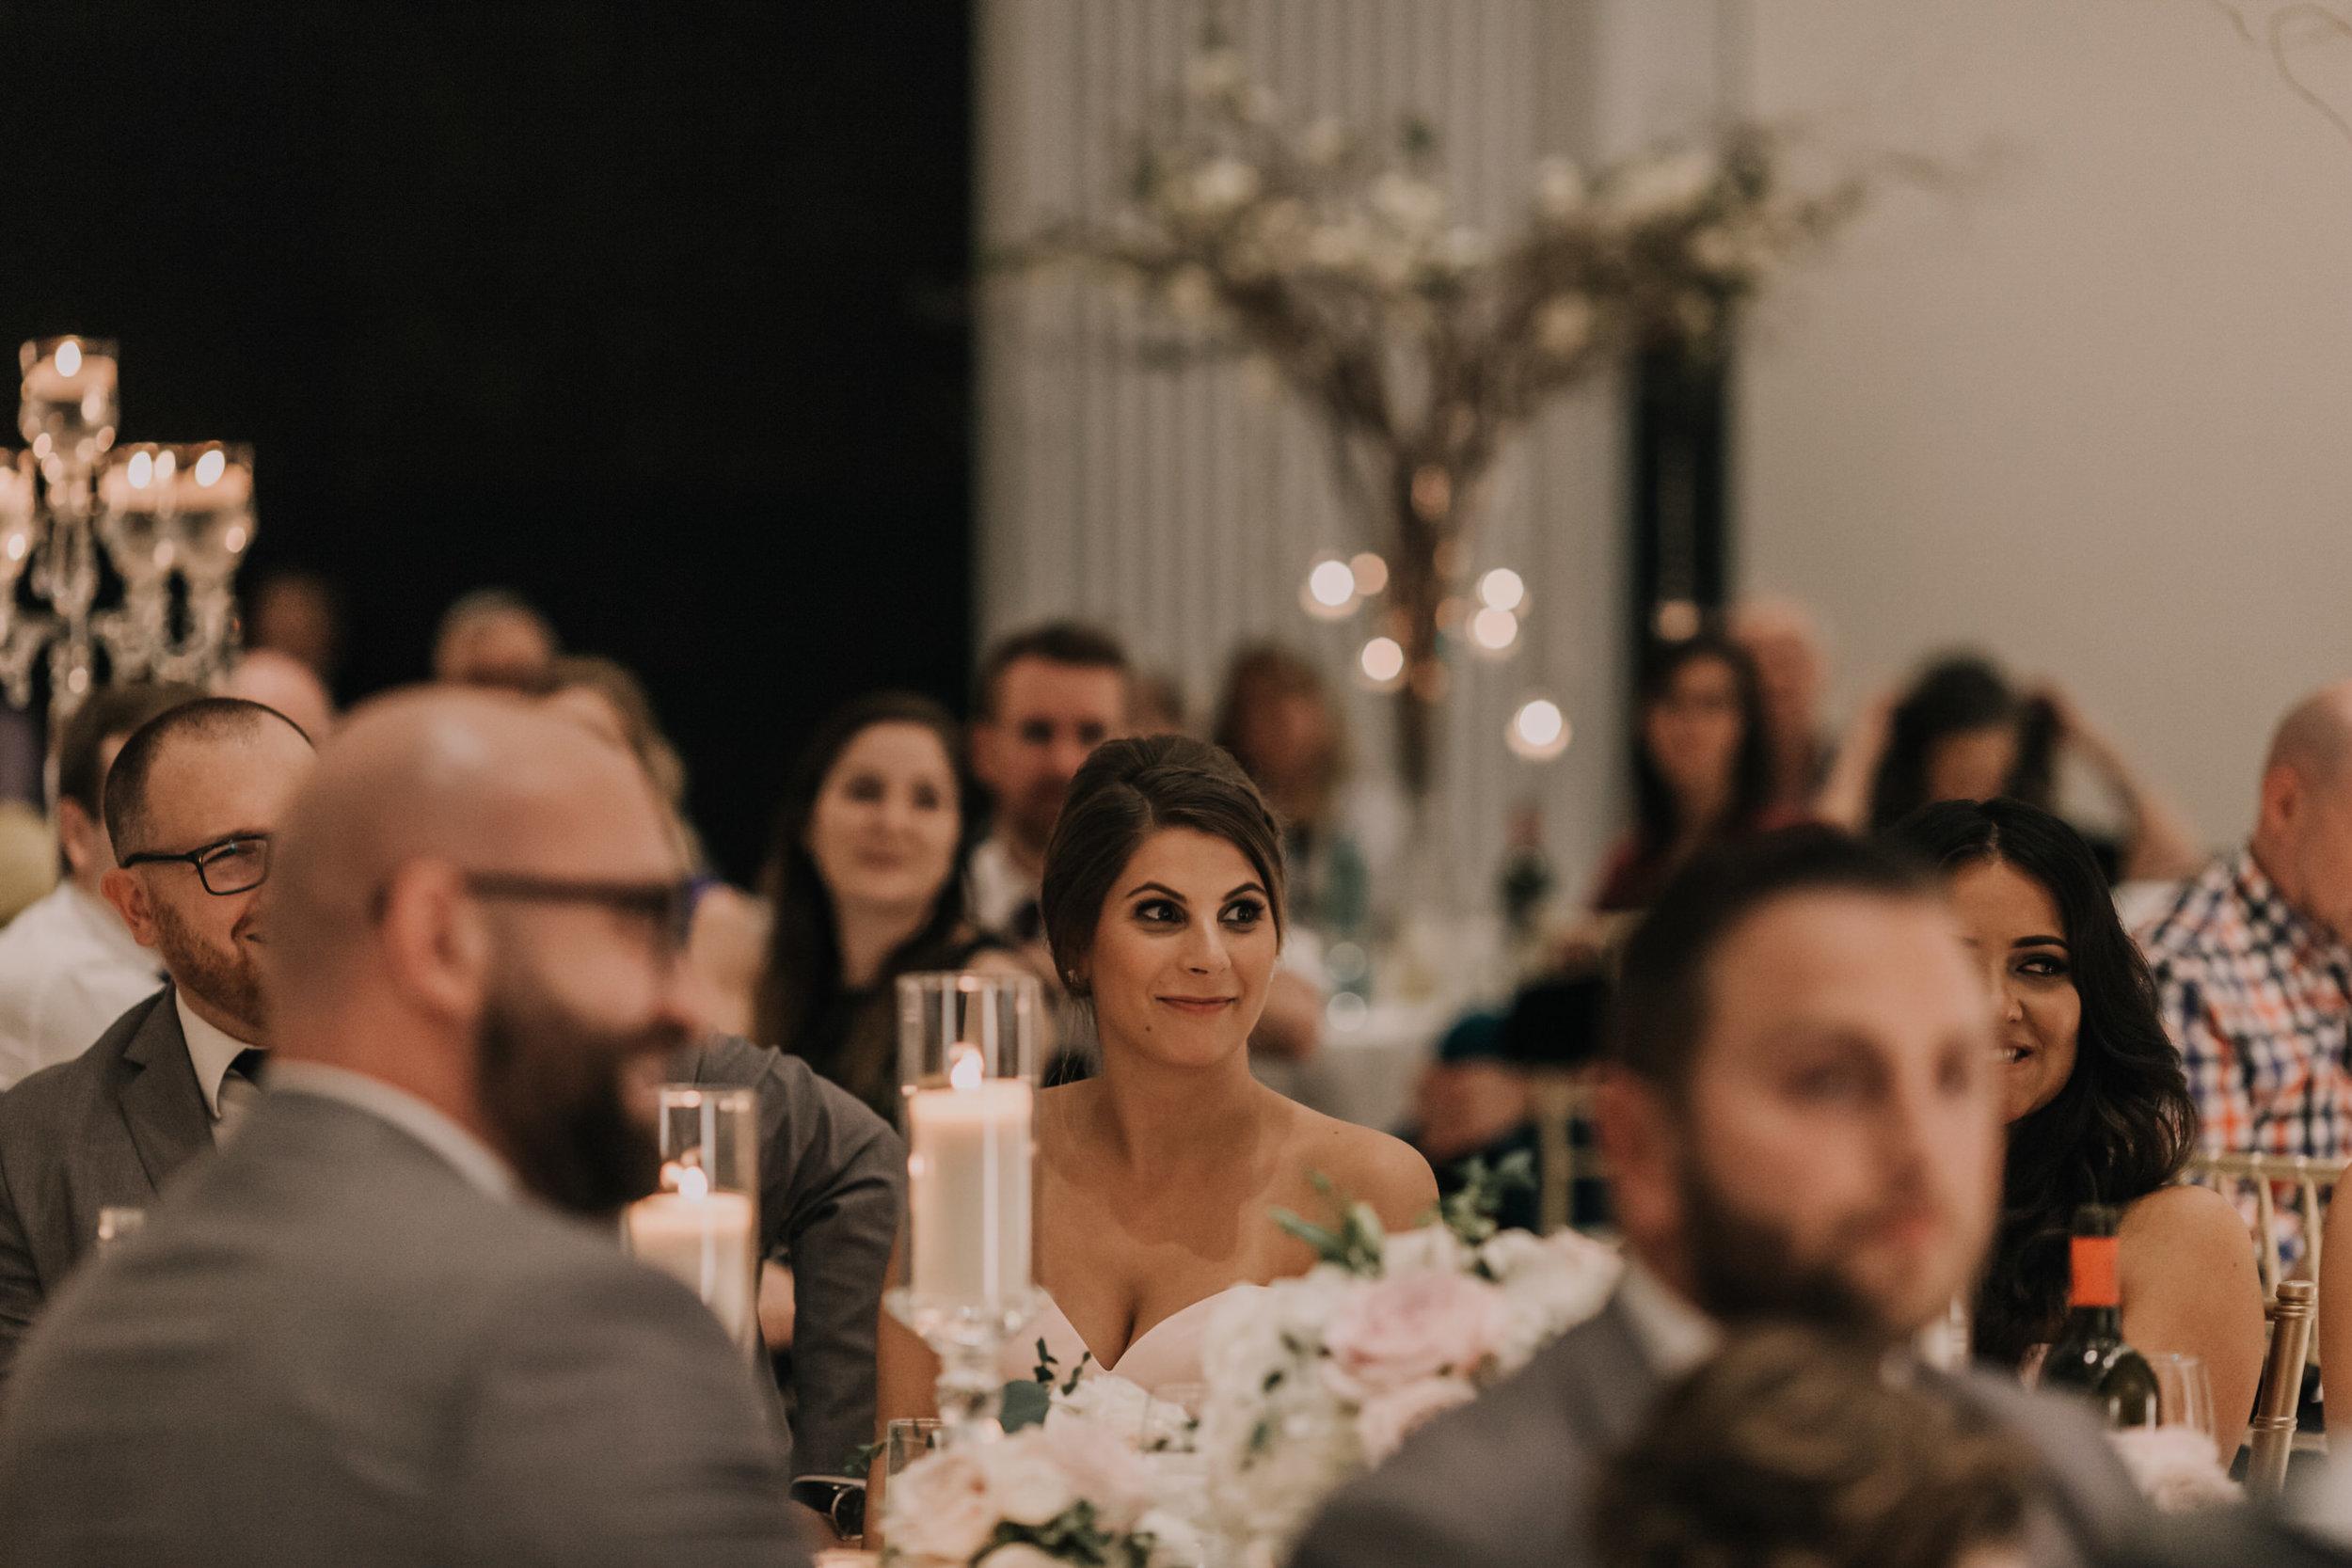 Pitt Meadows Wedding Photographer - Sky Hangar Wedding Photos - Vancouver Wedding Photographer & Videographer - Sunshine Coast Wedding Photos - Sunshine Coast Wedding Photographer - Jennifer Picard Photography - IMG_6428.jpg